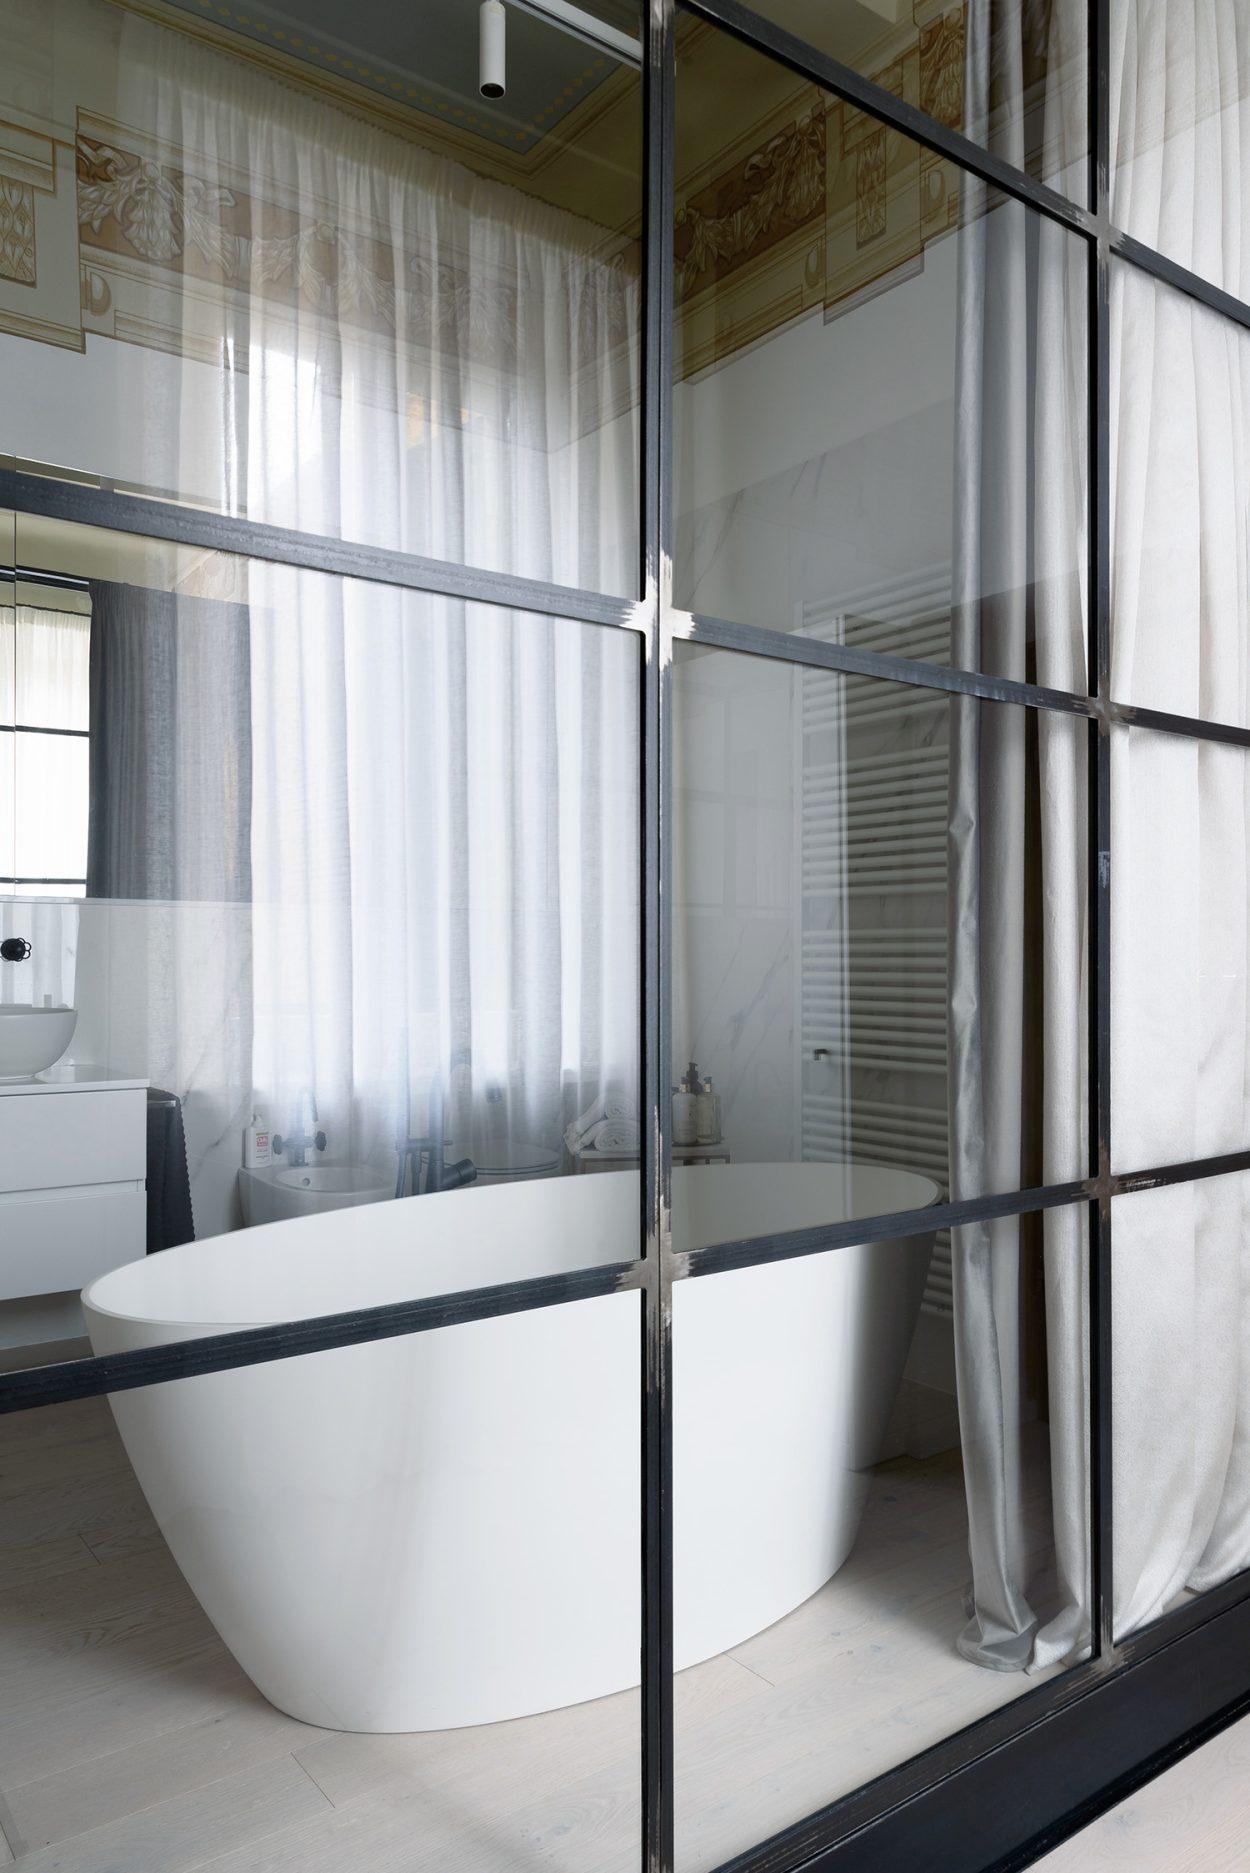 9-Ristrutturazione-Appartamento-Cesena-di-qualità-1250x1873.jpg